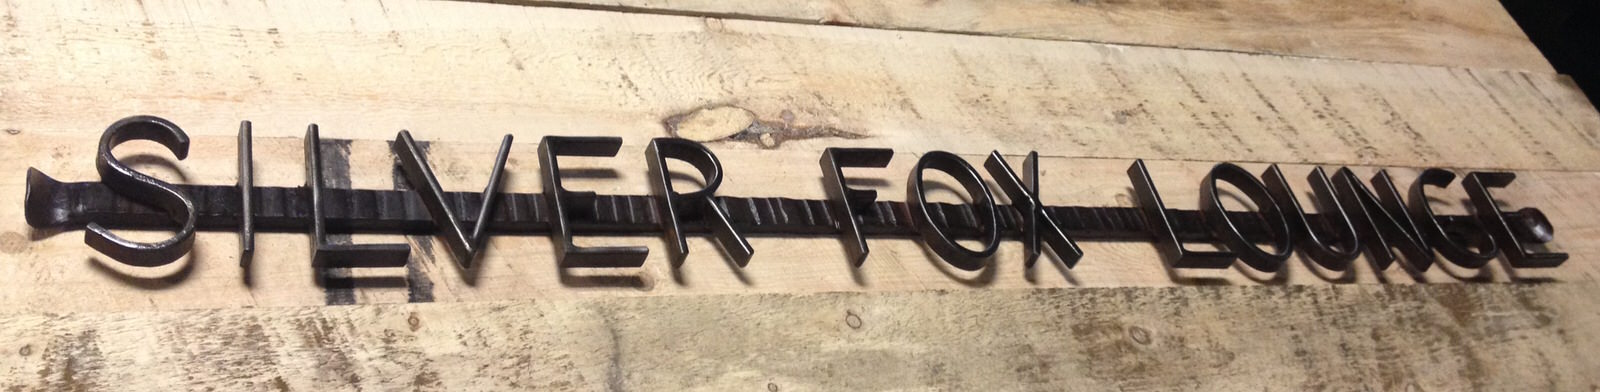 Silver Fox Sign